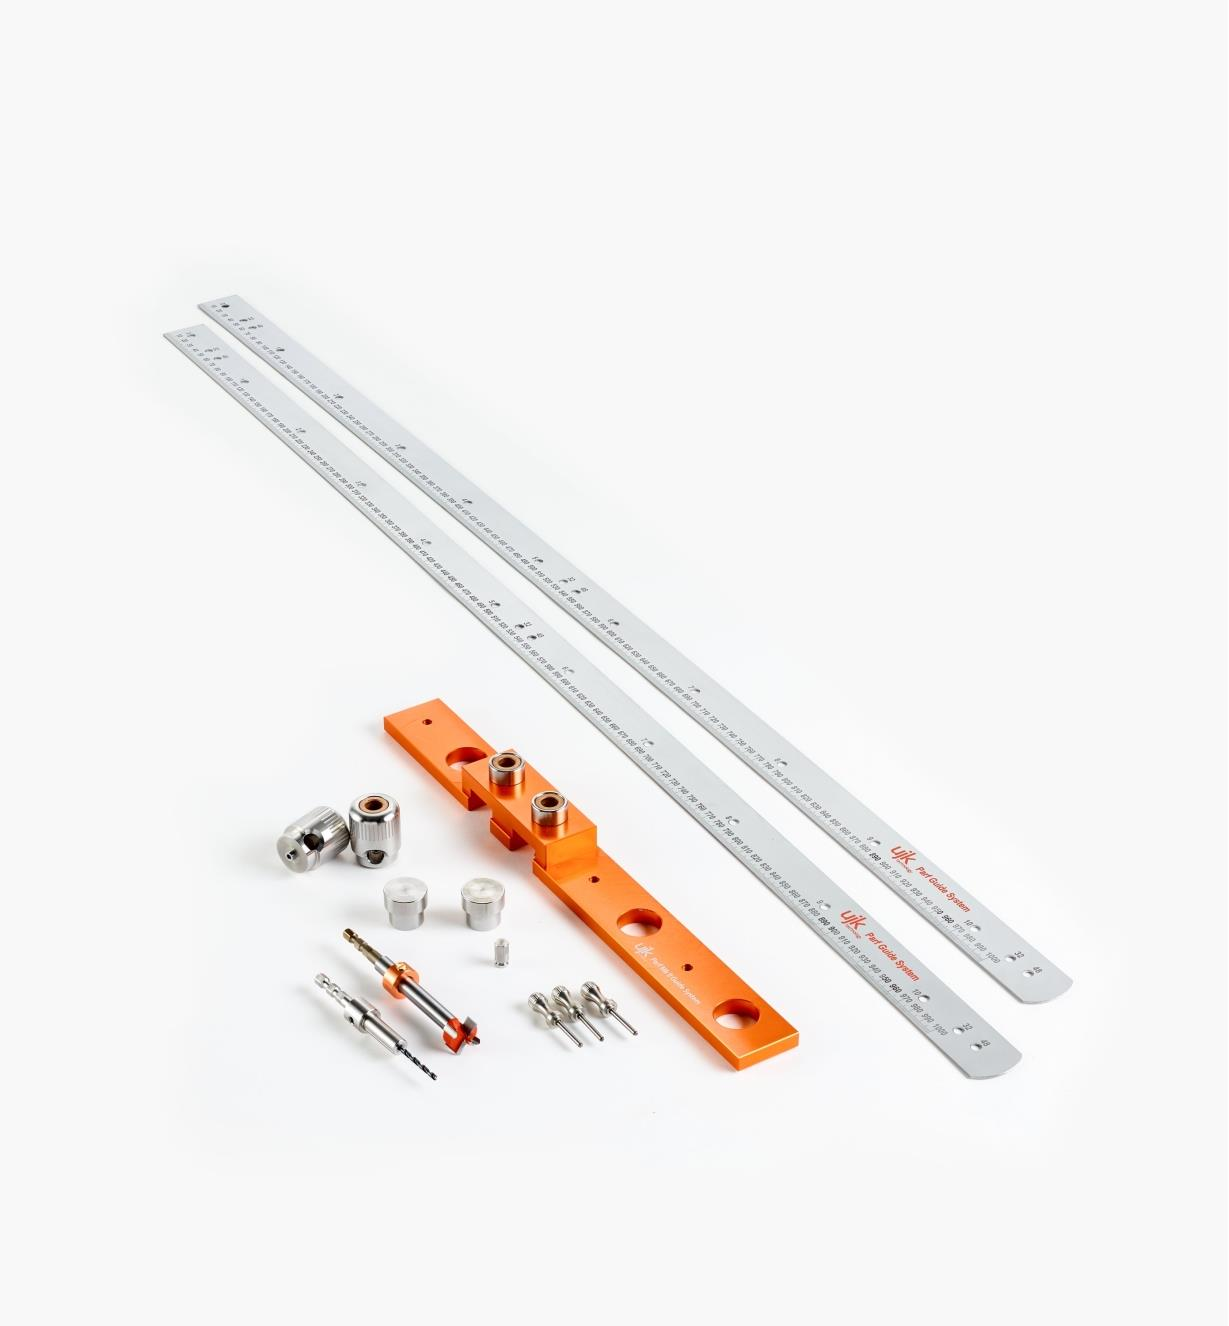 58B3996 - Mk.II Parf Guide Drilling System